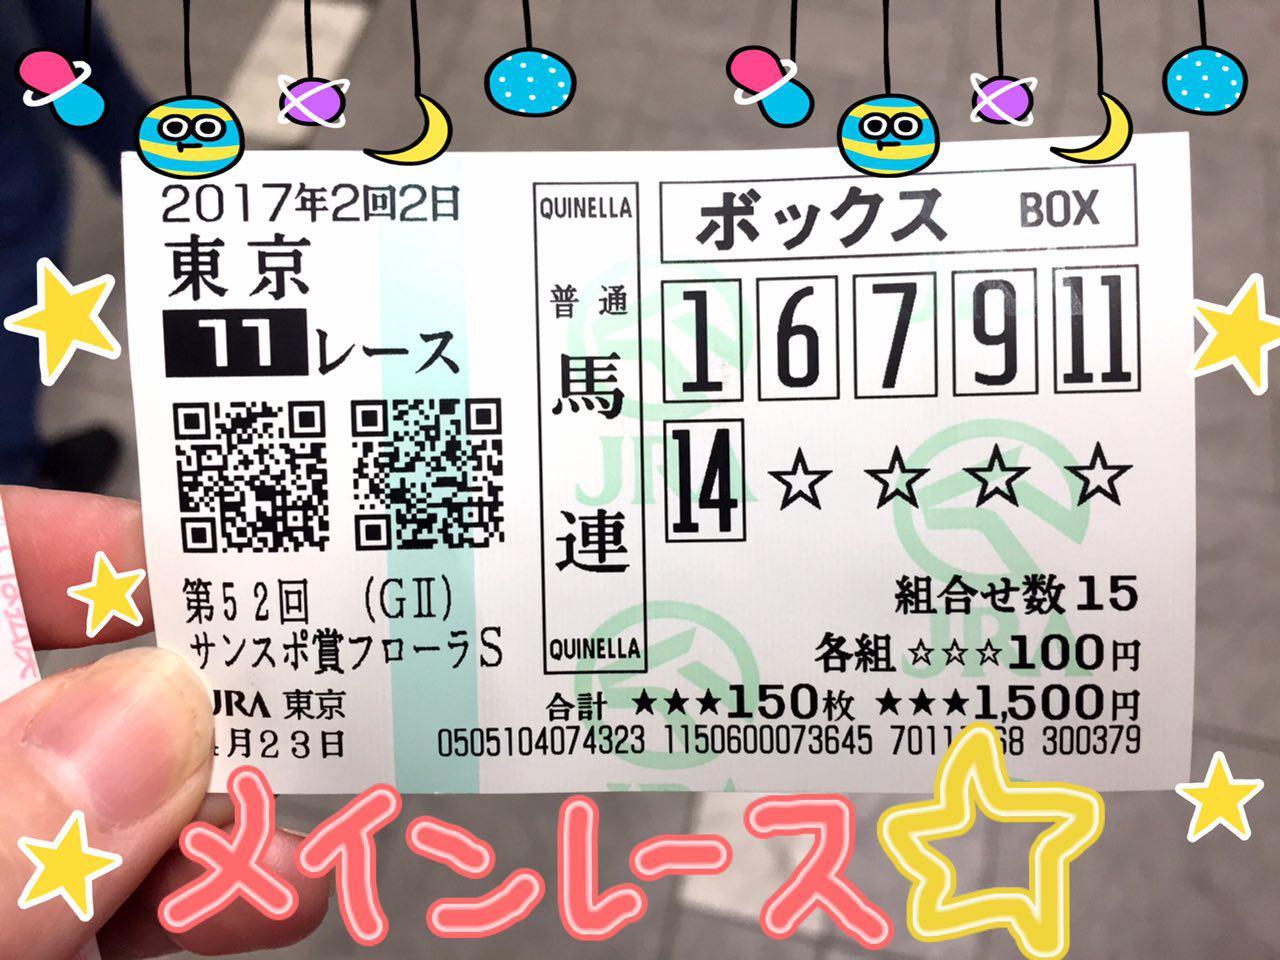 photo_2017-04-24_01-00-05.jpg